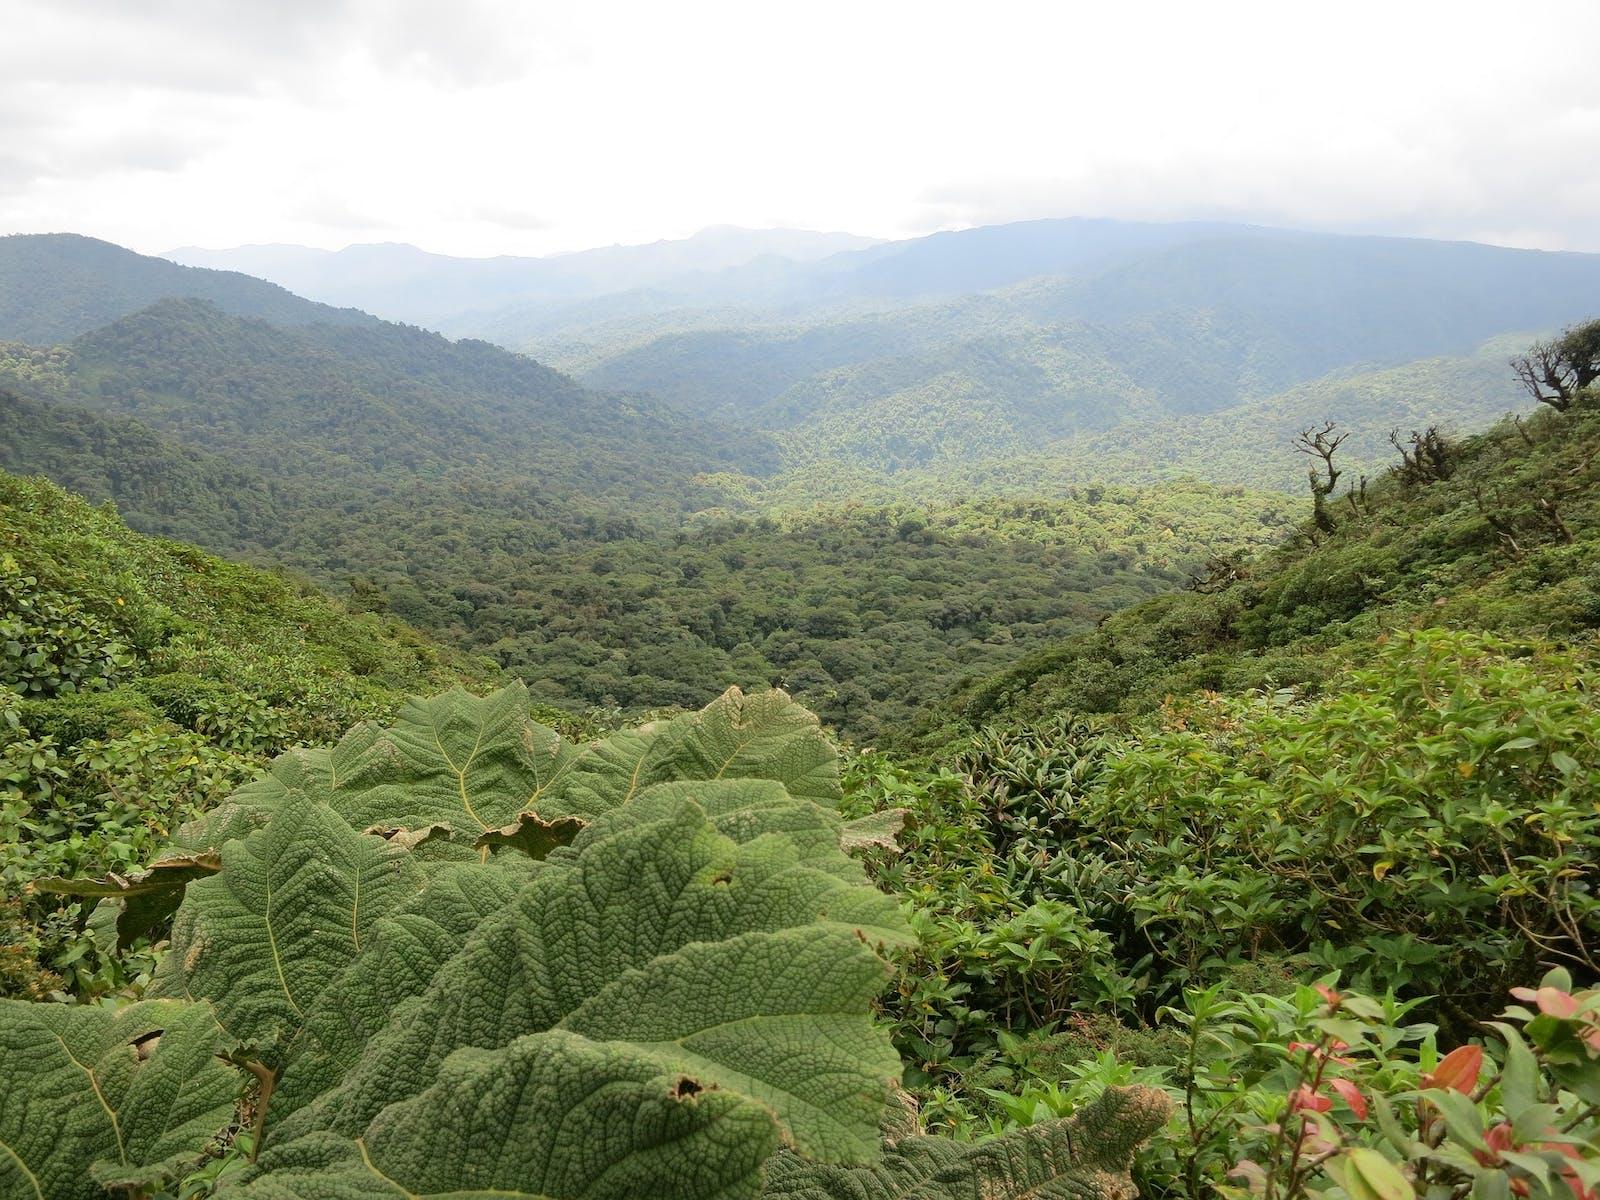 Monteverde Forest in Costa Rica